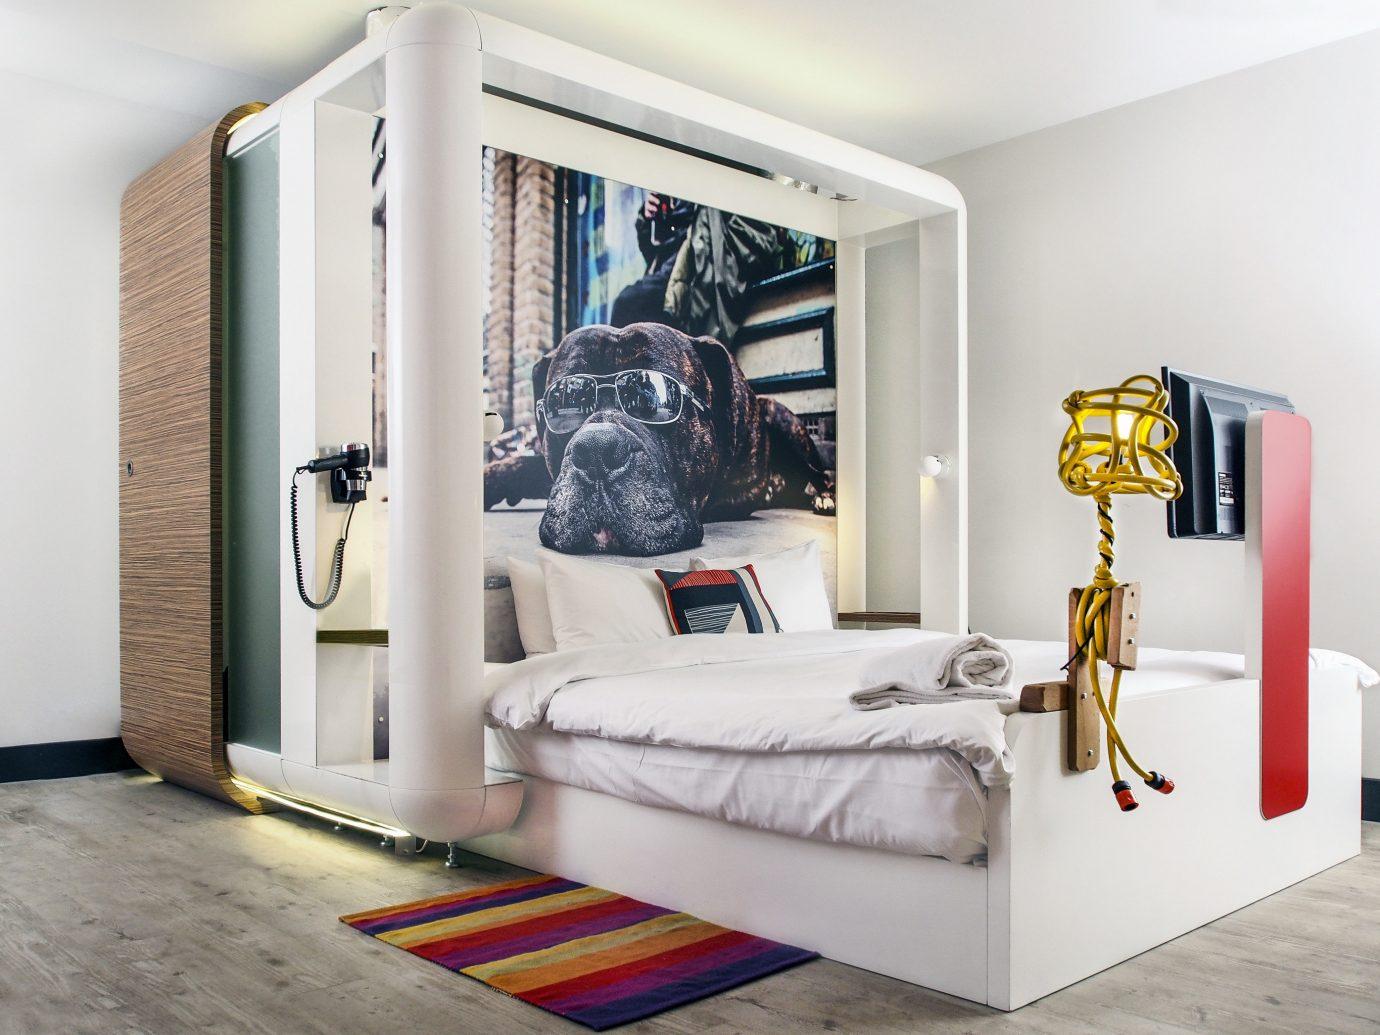 Budget Hotels London wall indoor room furniture Bedroom bed interior design living room home